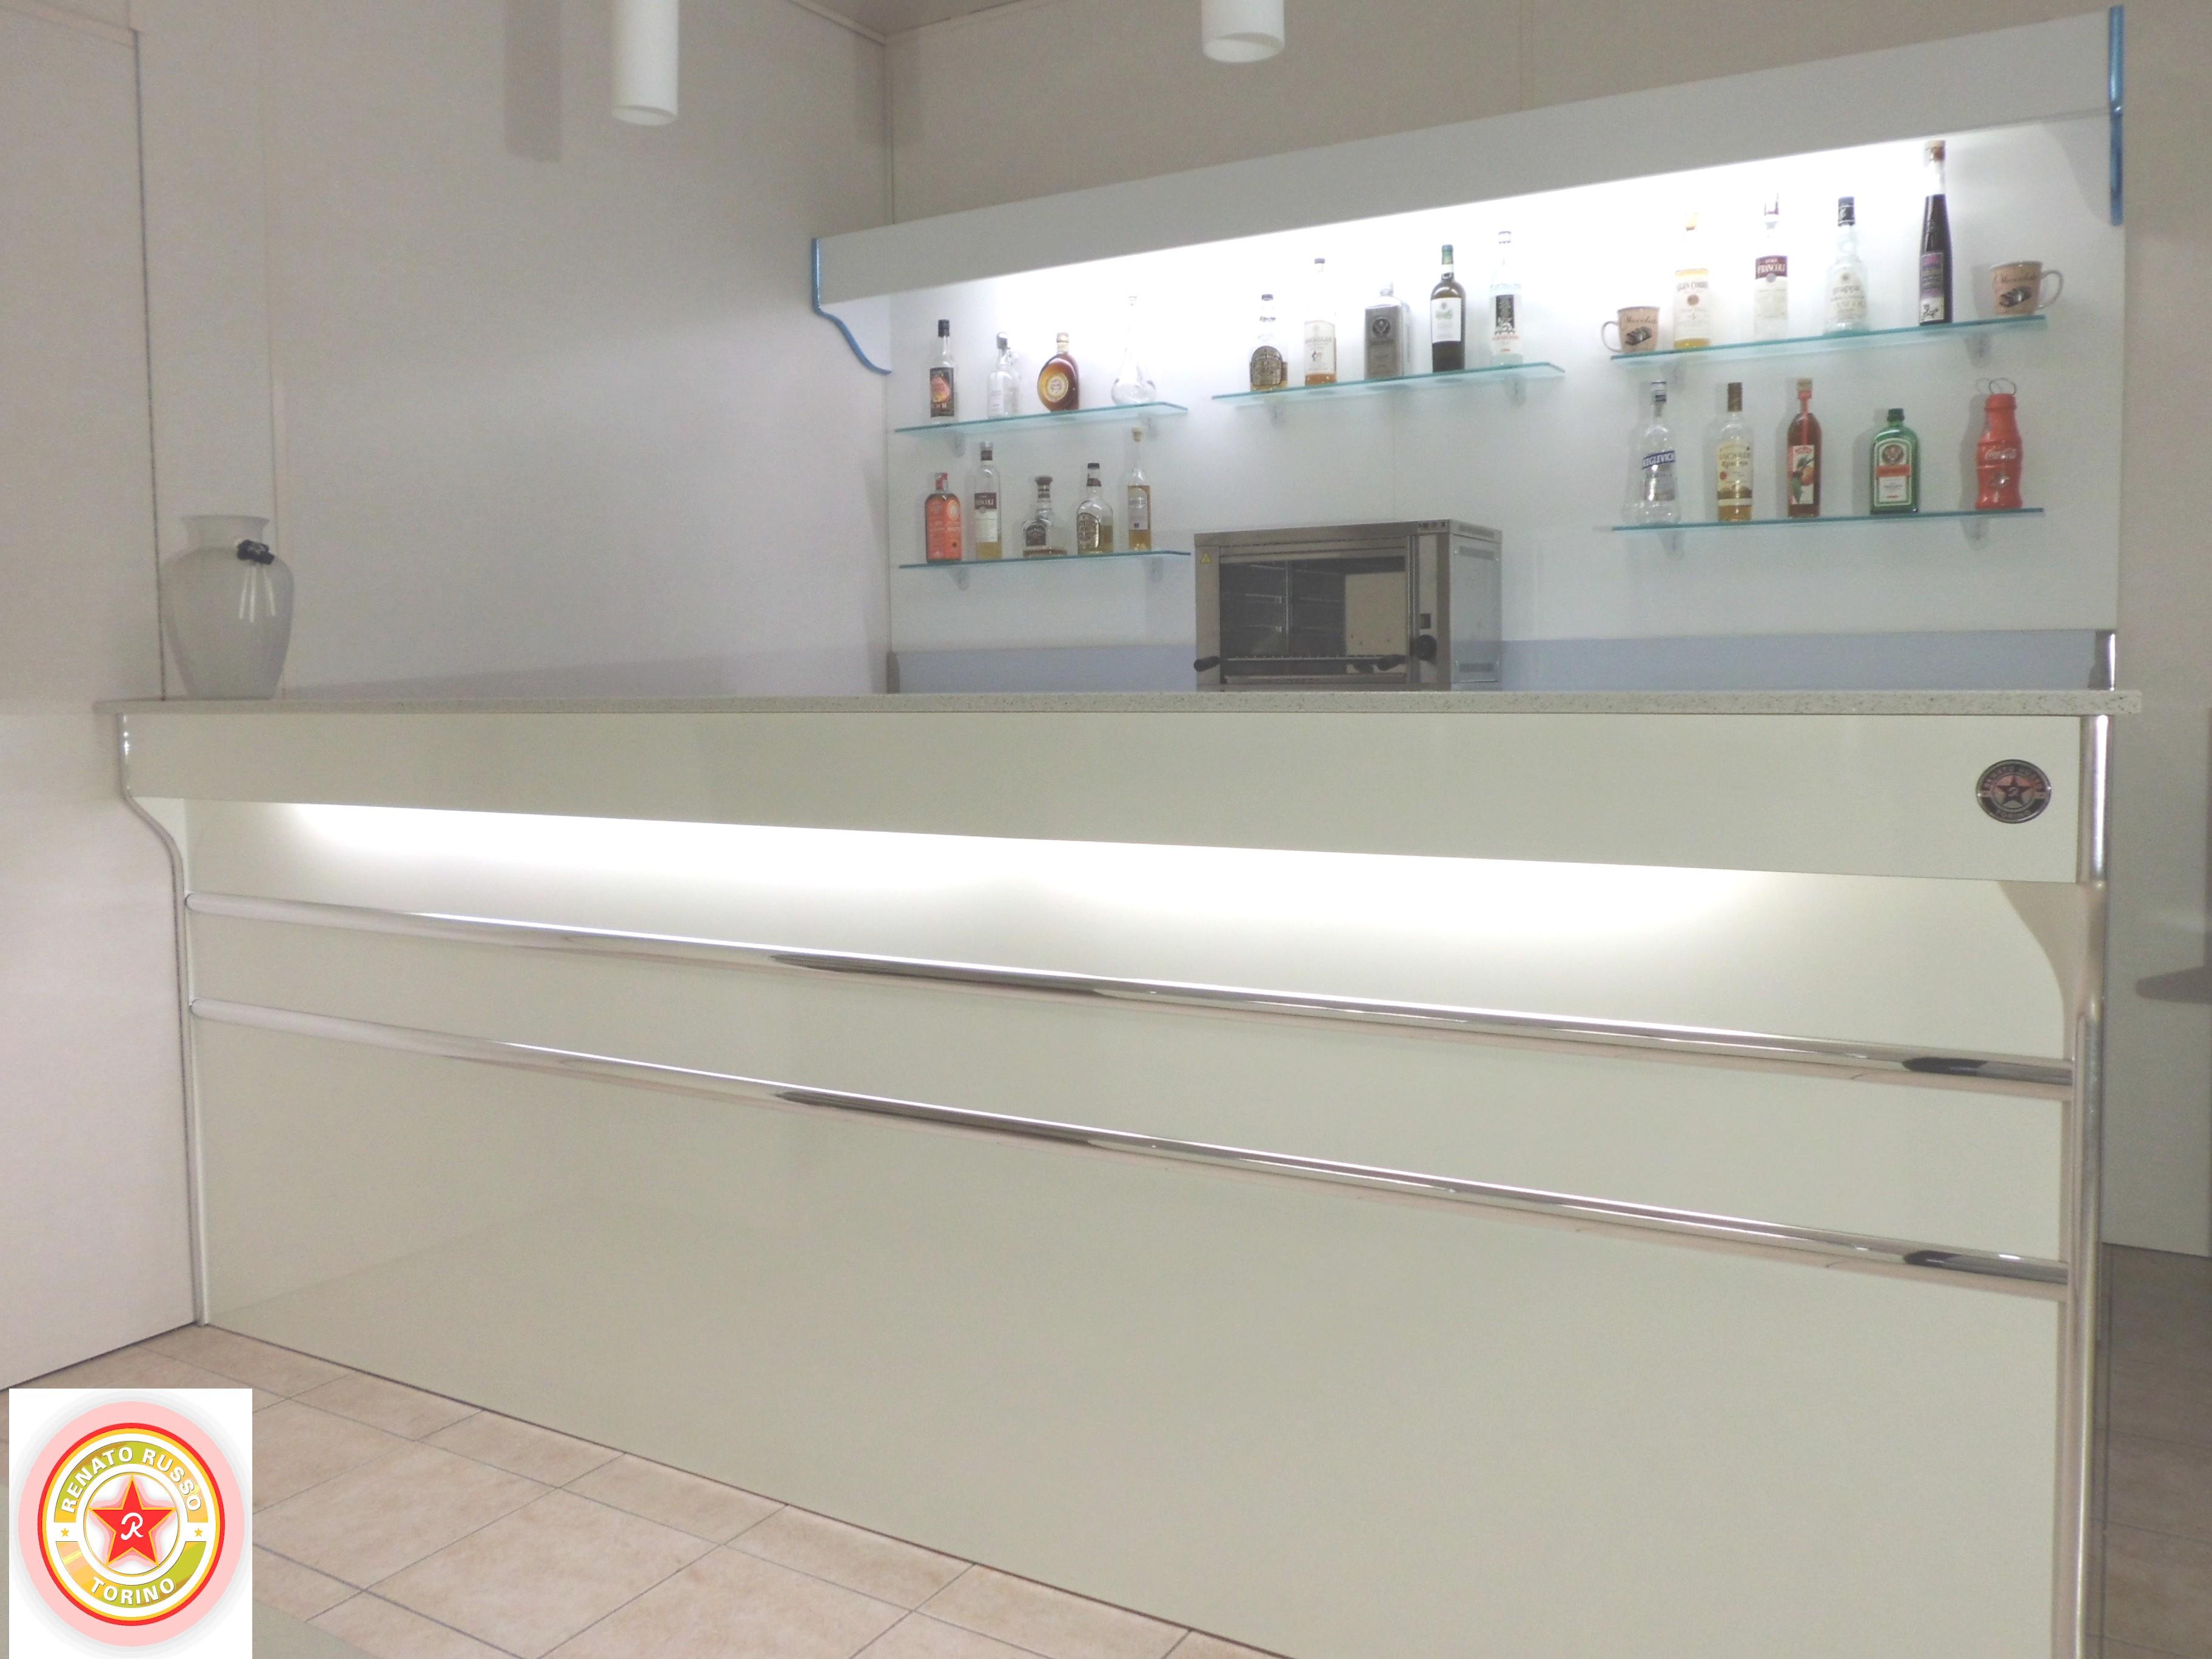 Banchi frigo dal 1980 produttori di banchi frigo for Banconi bar usati prezzi